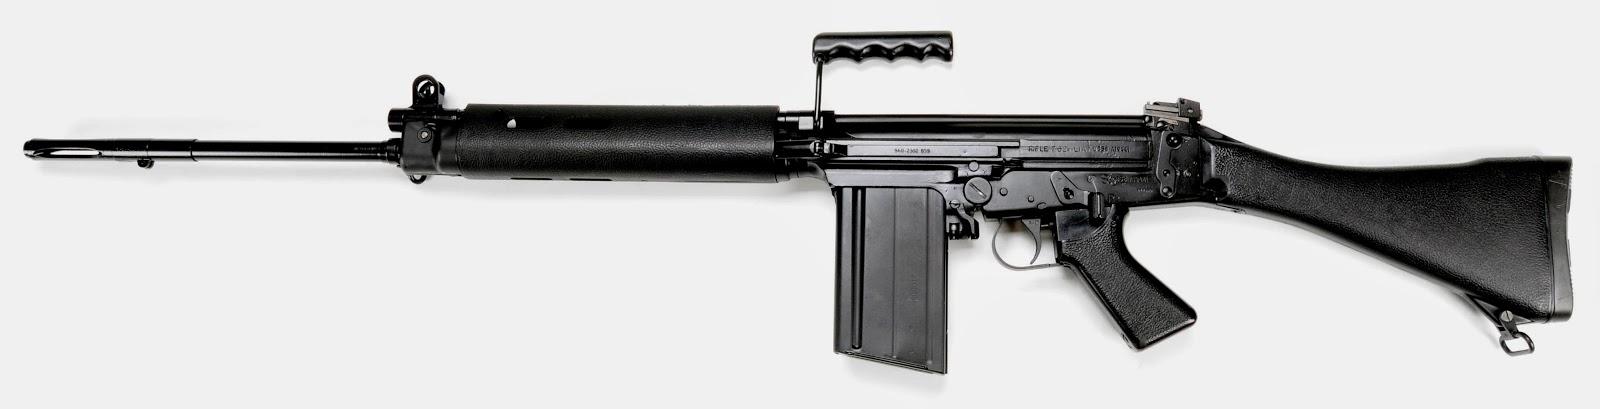 FN FAL L1A1.JPG